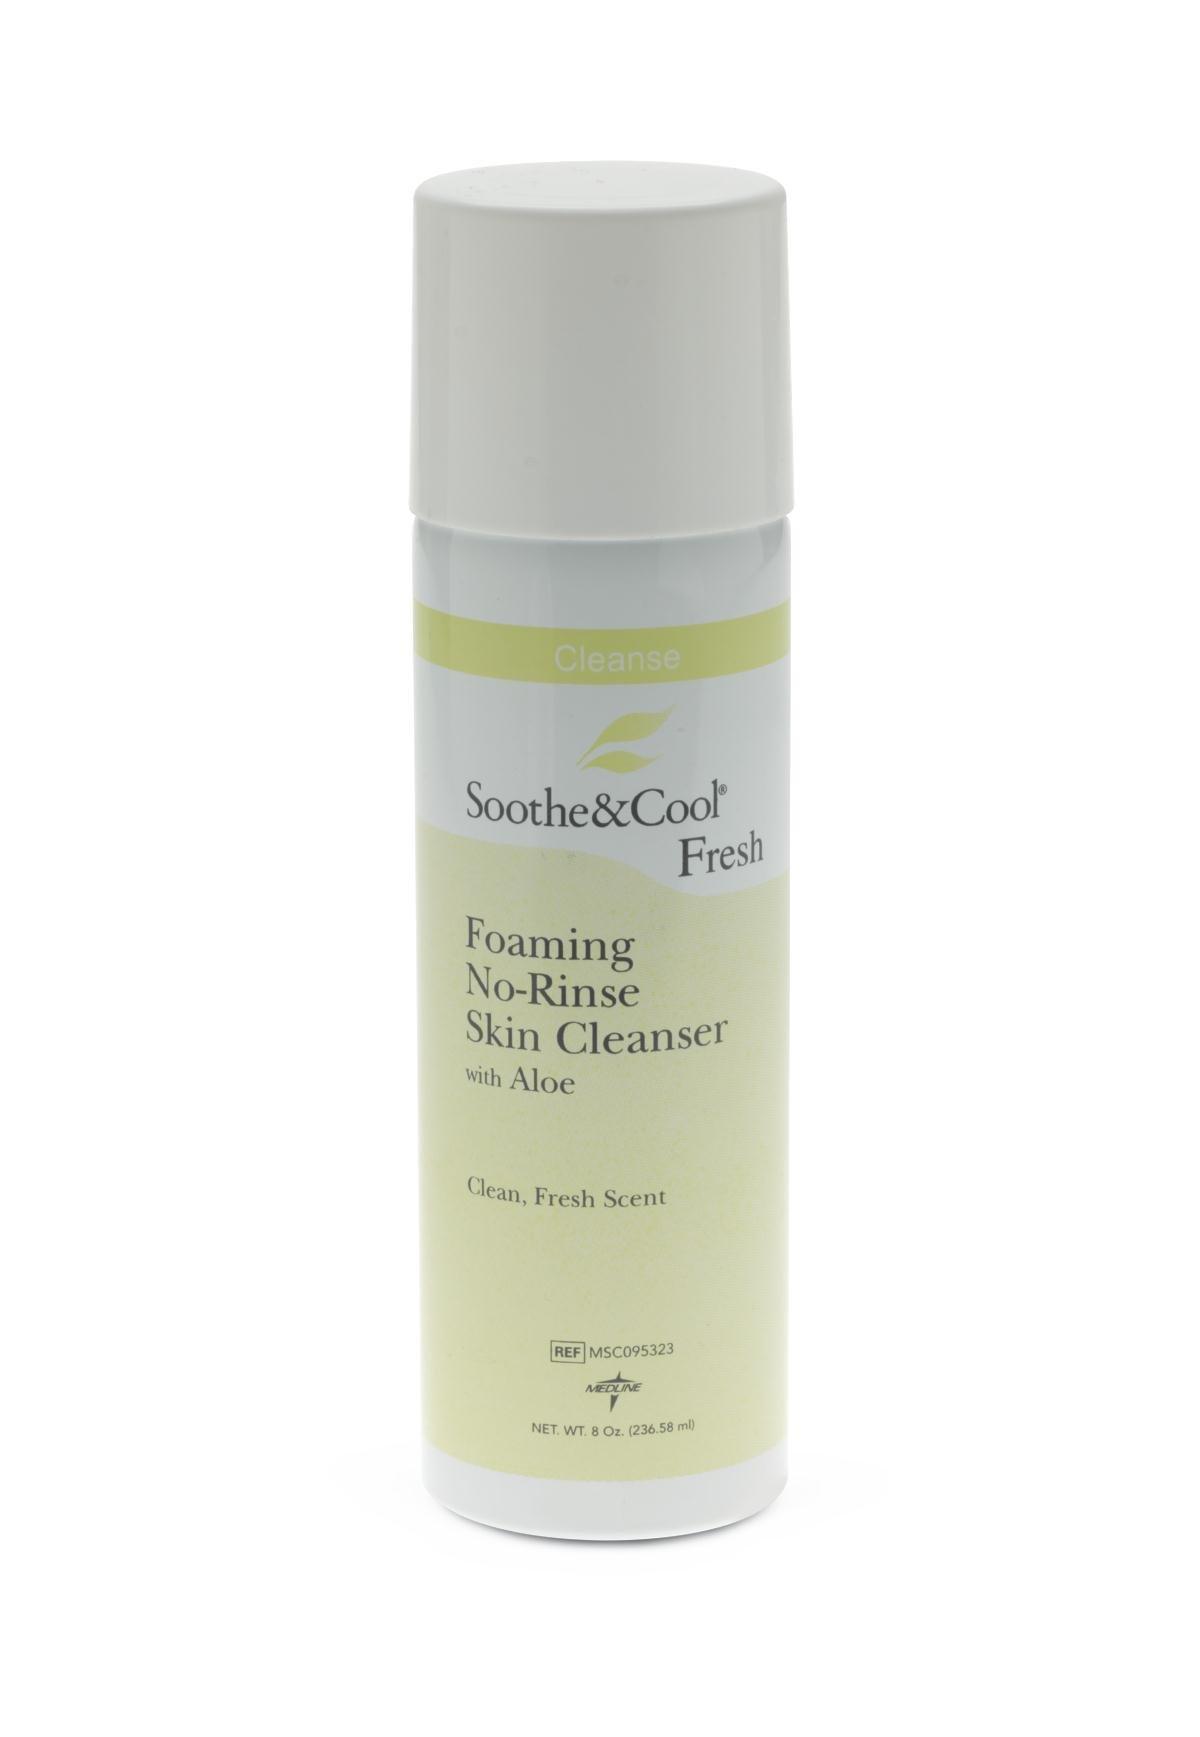 Medline MSC095323 Soothe & Cool Foaming No-Rinse Skin Cleanser, 8oz. (Case of 24)